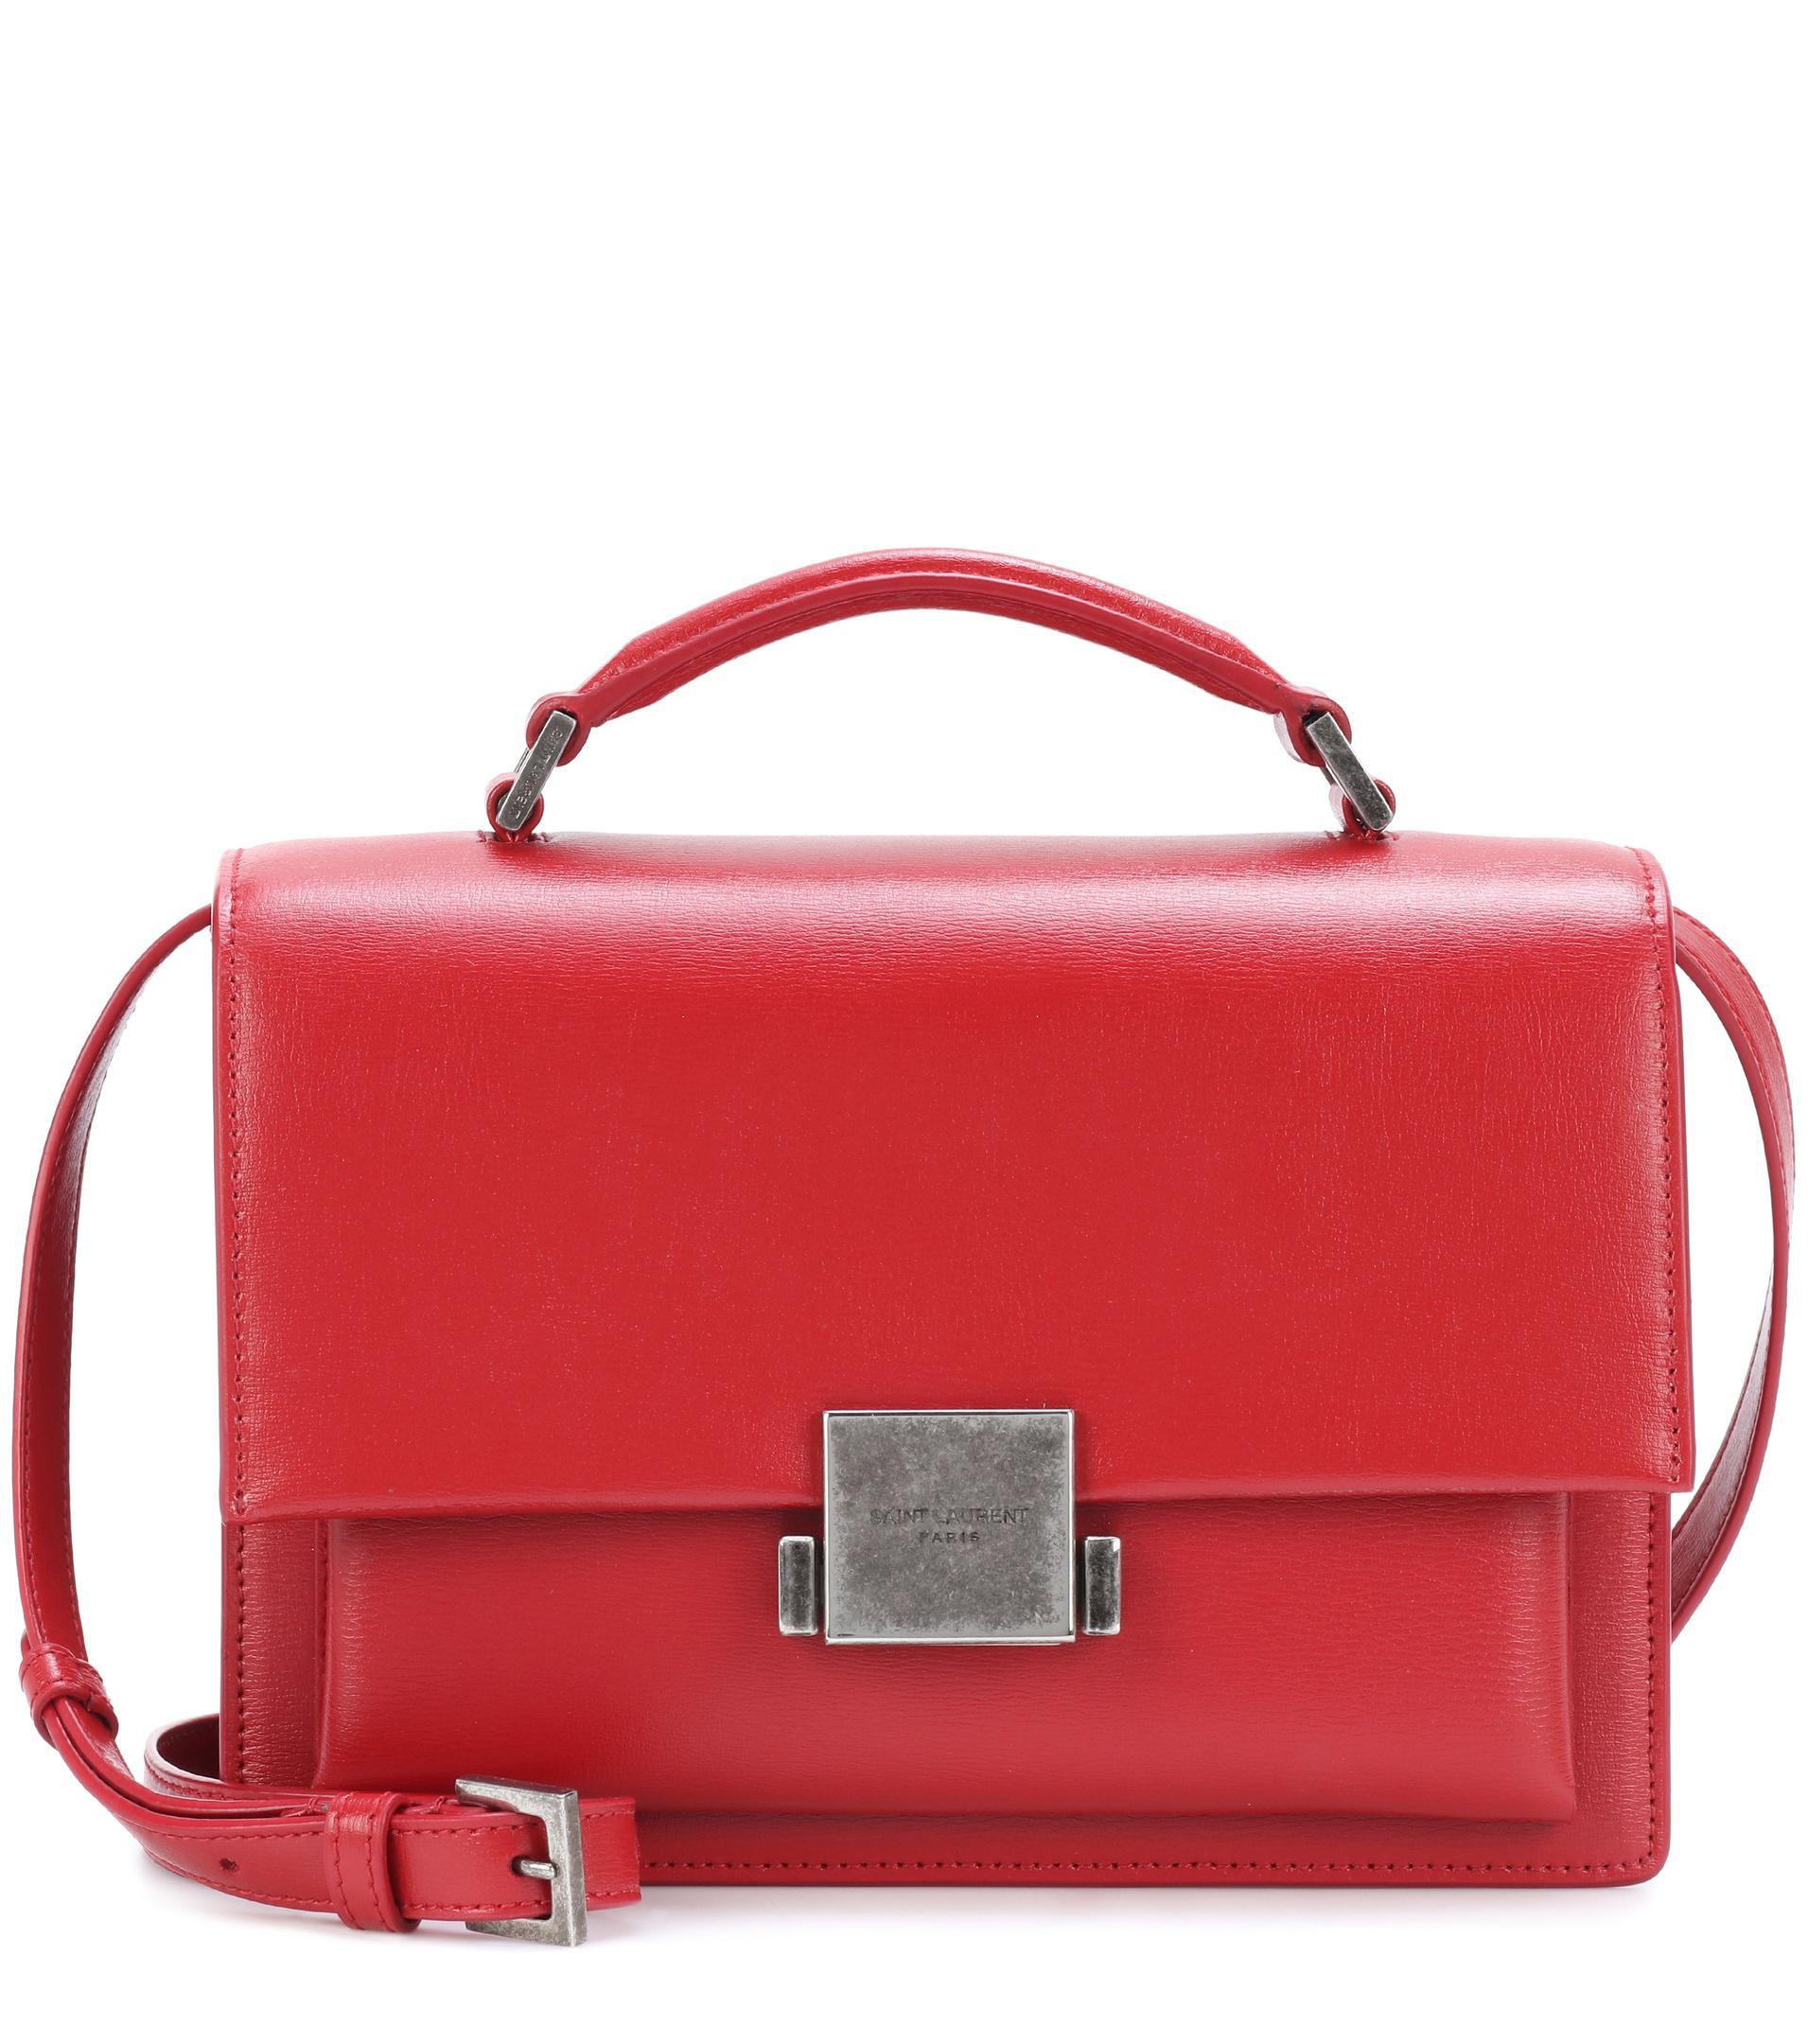 3c8c893537 Saint Laurent Medium Bellechasse Shoulder Bag in Red - Lyst